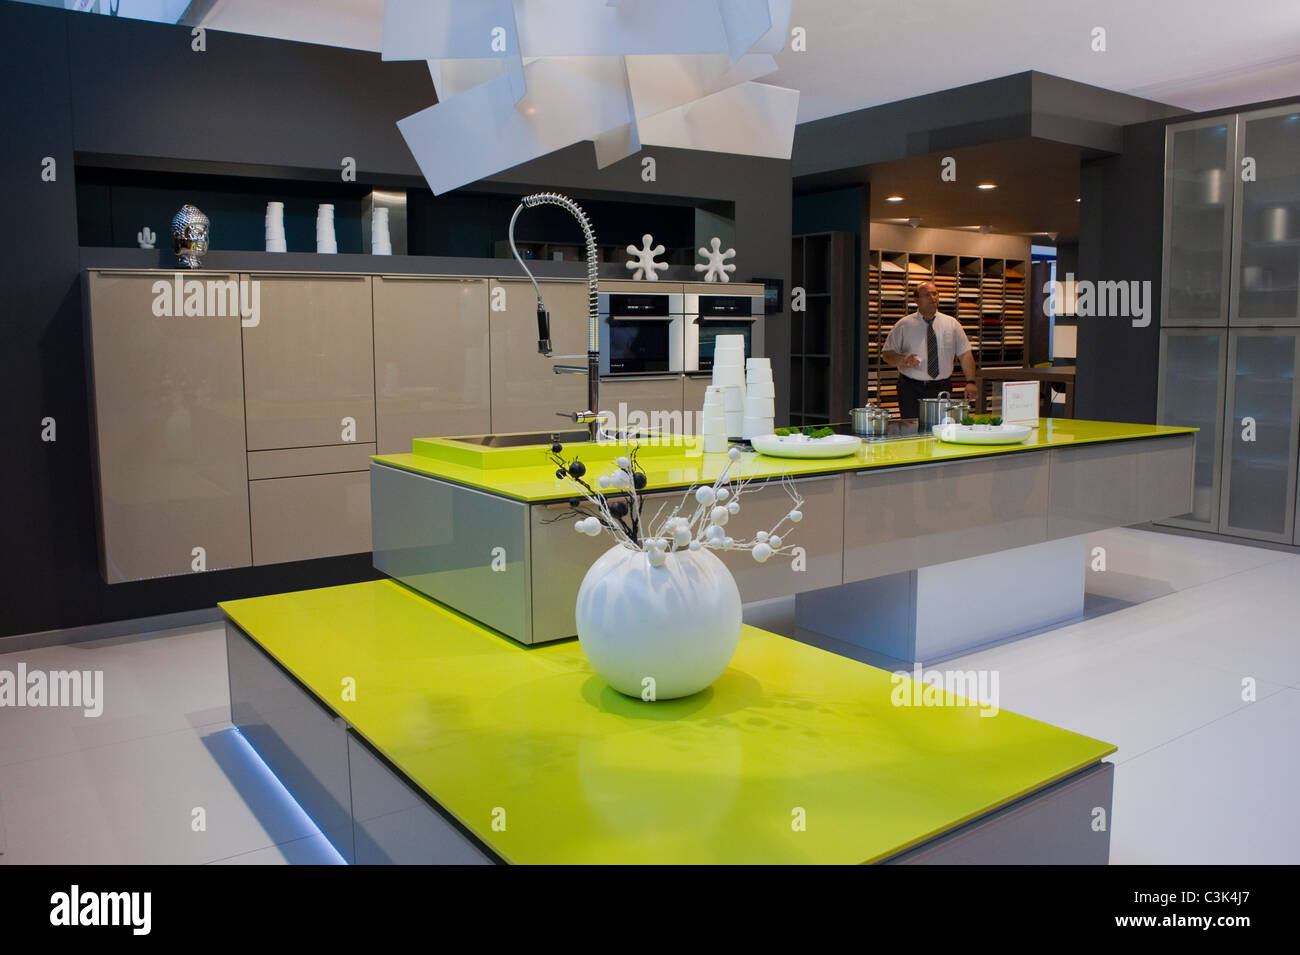 paris france contemporary design kitchen at trade show. Black Bedroom Furniture Sets. Home Design Ideas